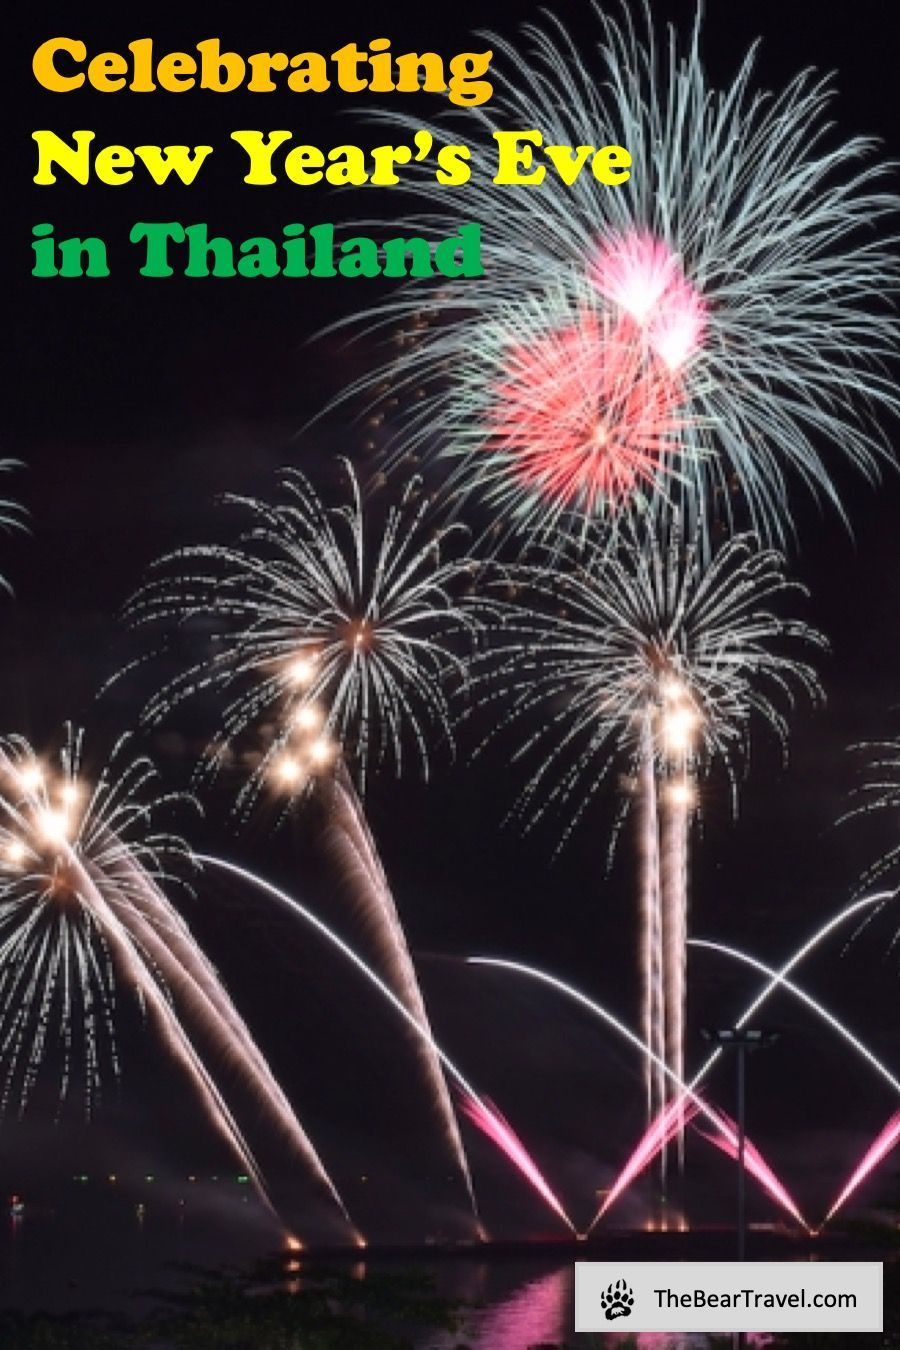 Celebrating New Year's Eve in Thailand ในปี 2020 (มีรูปภาพ)